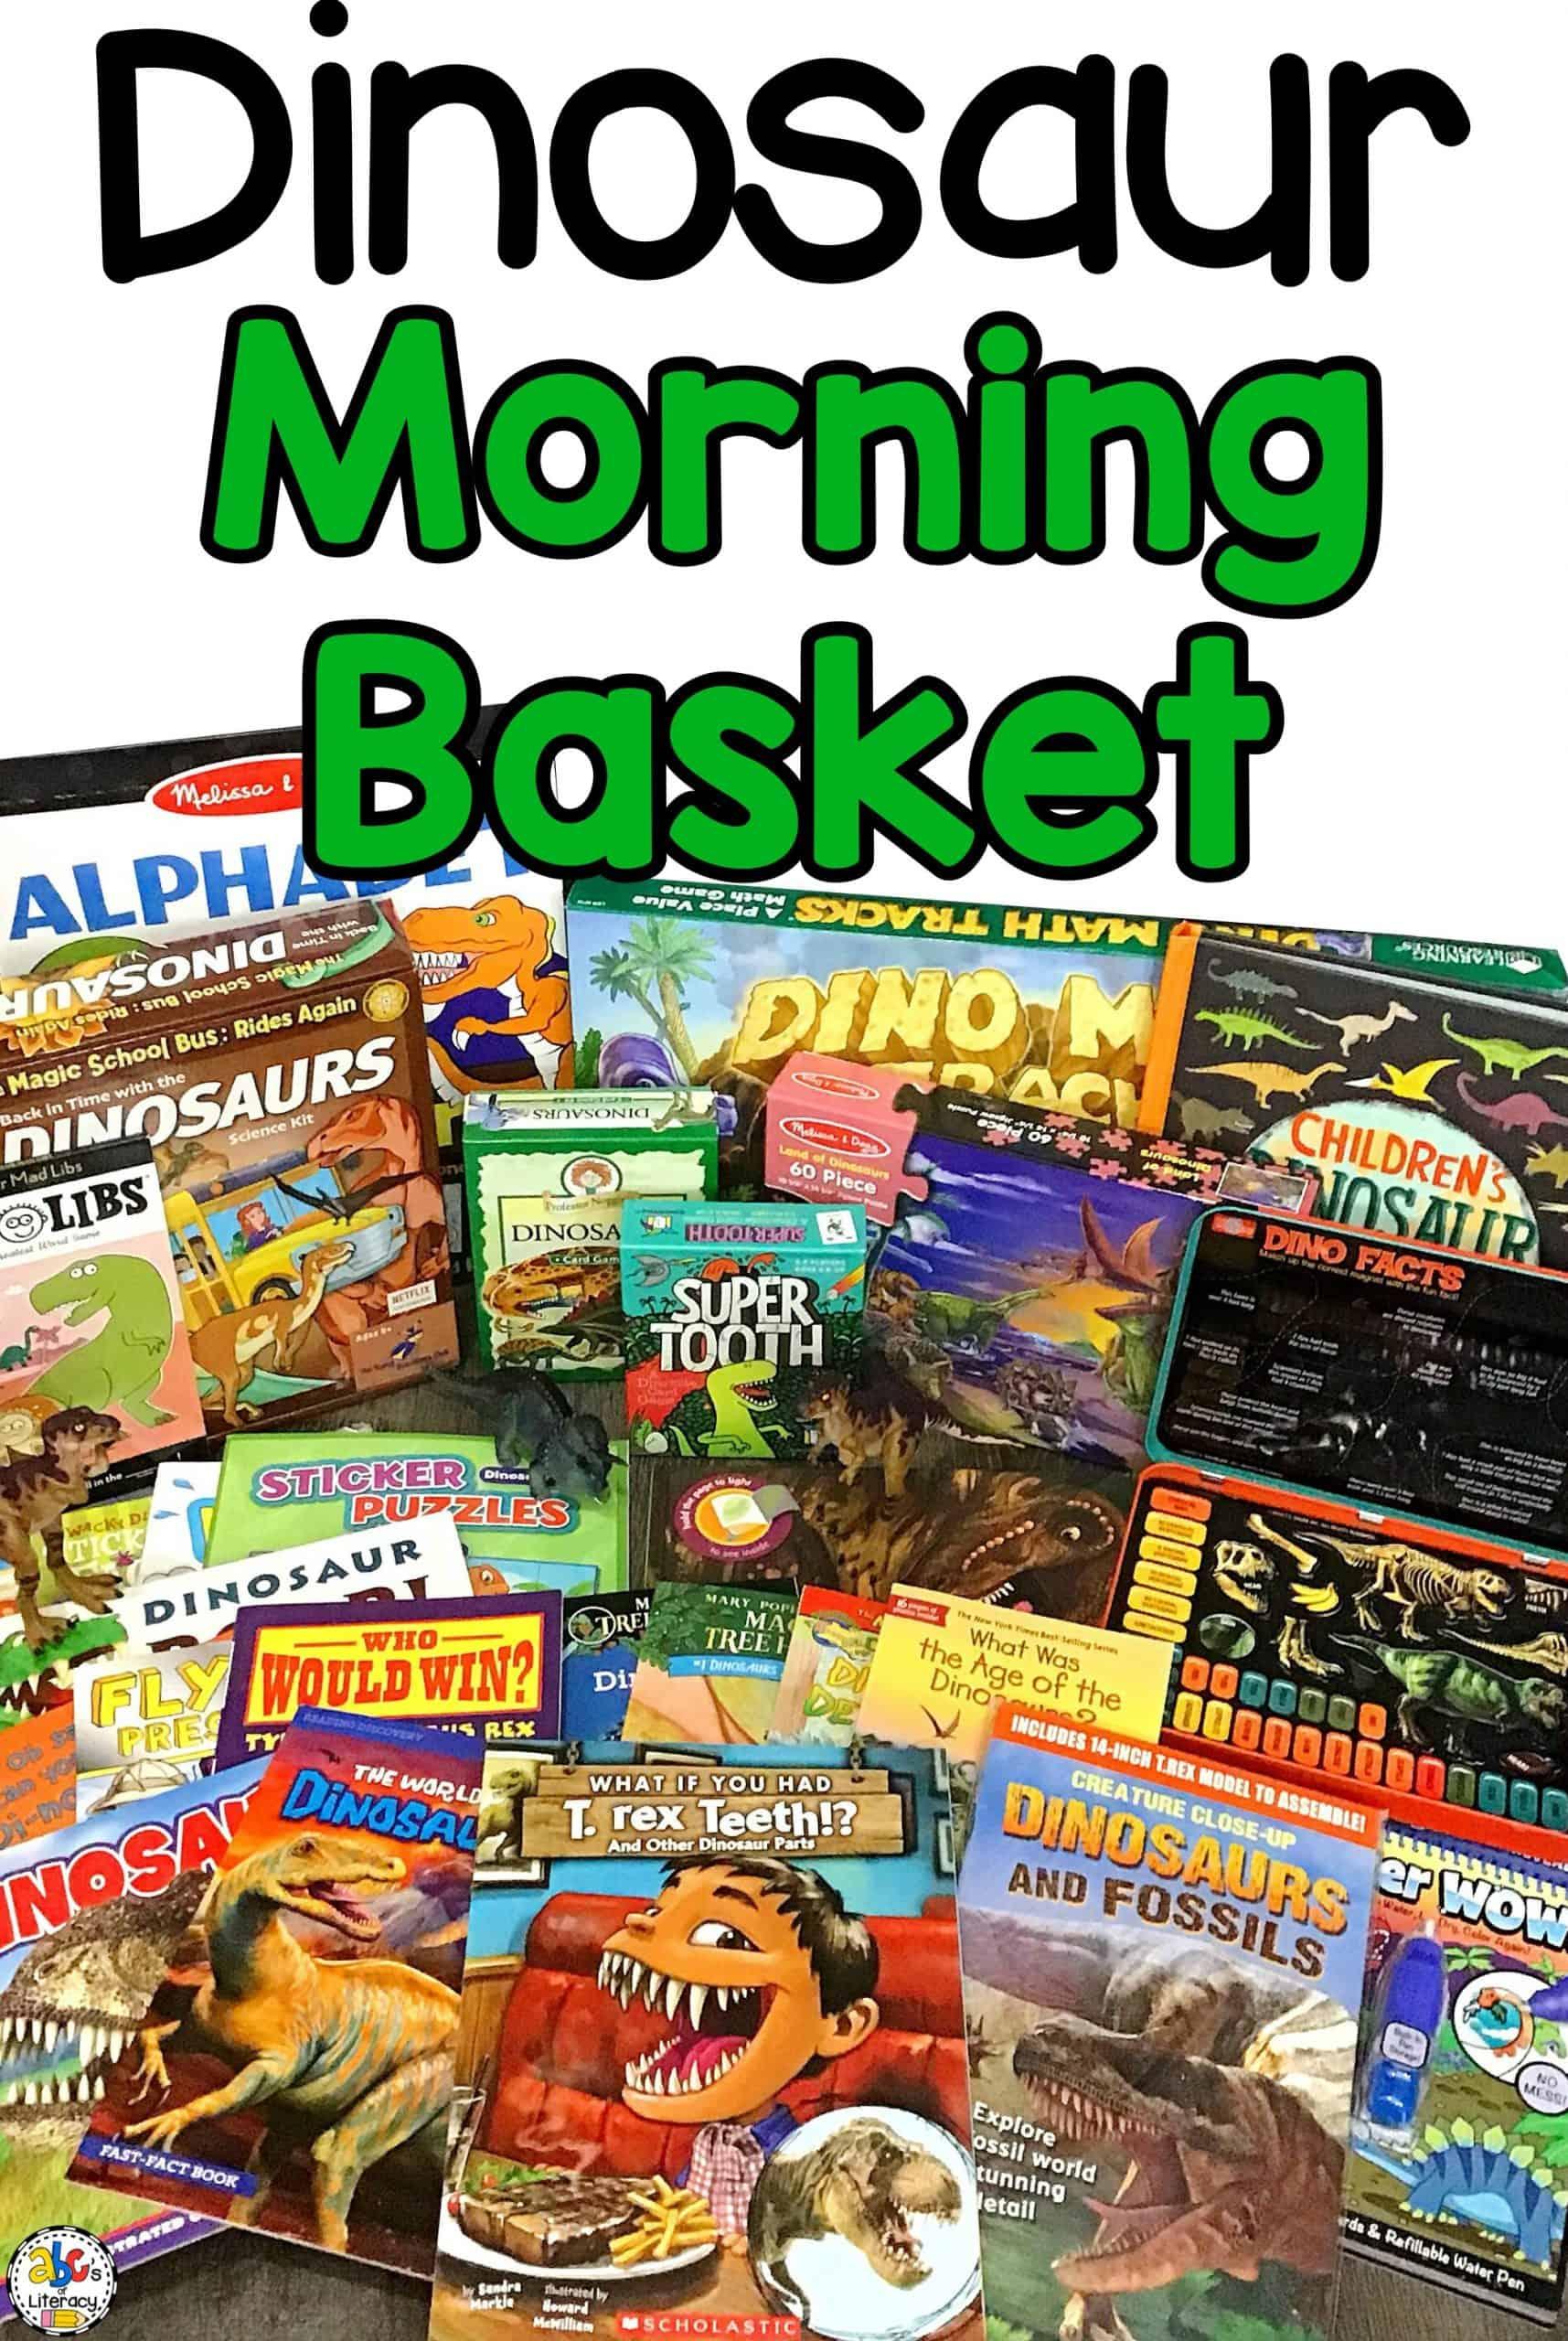 Dinosaur Morning Basket